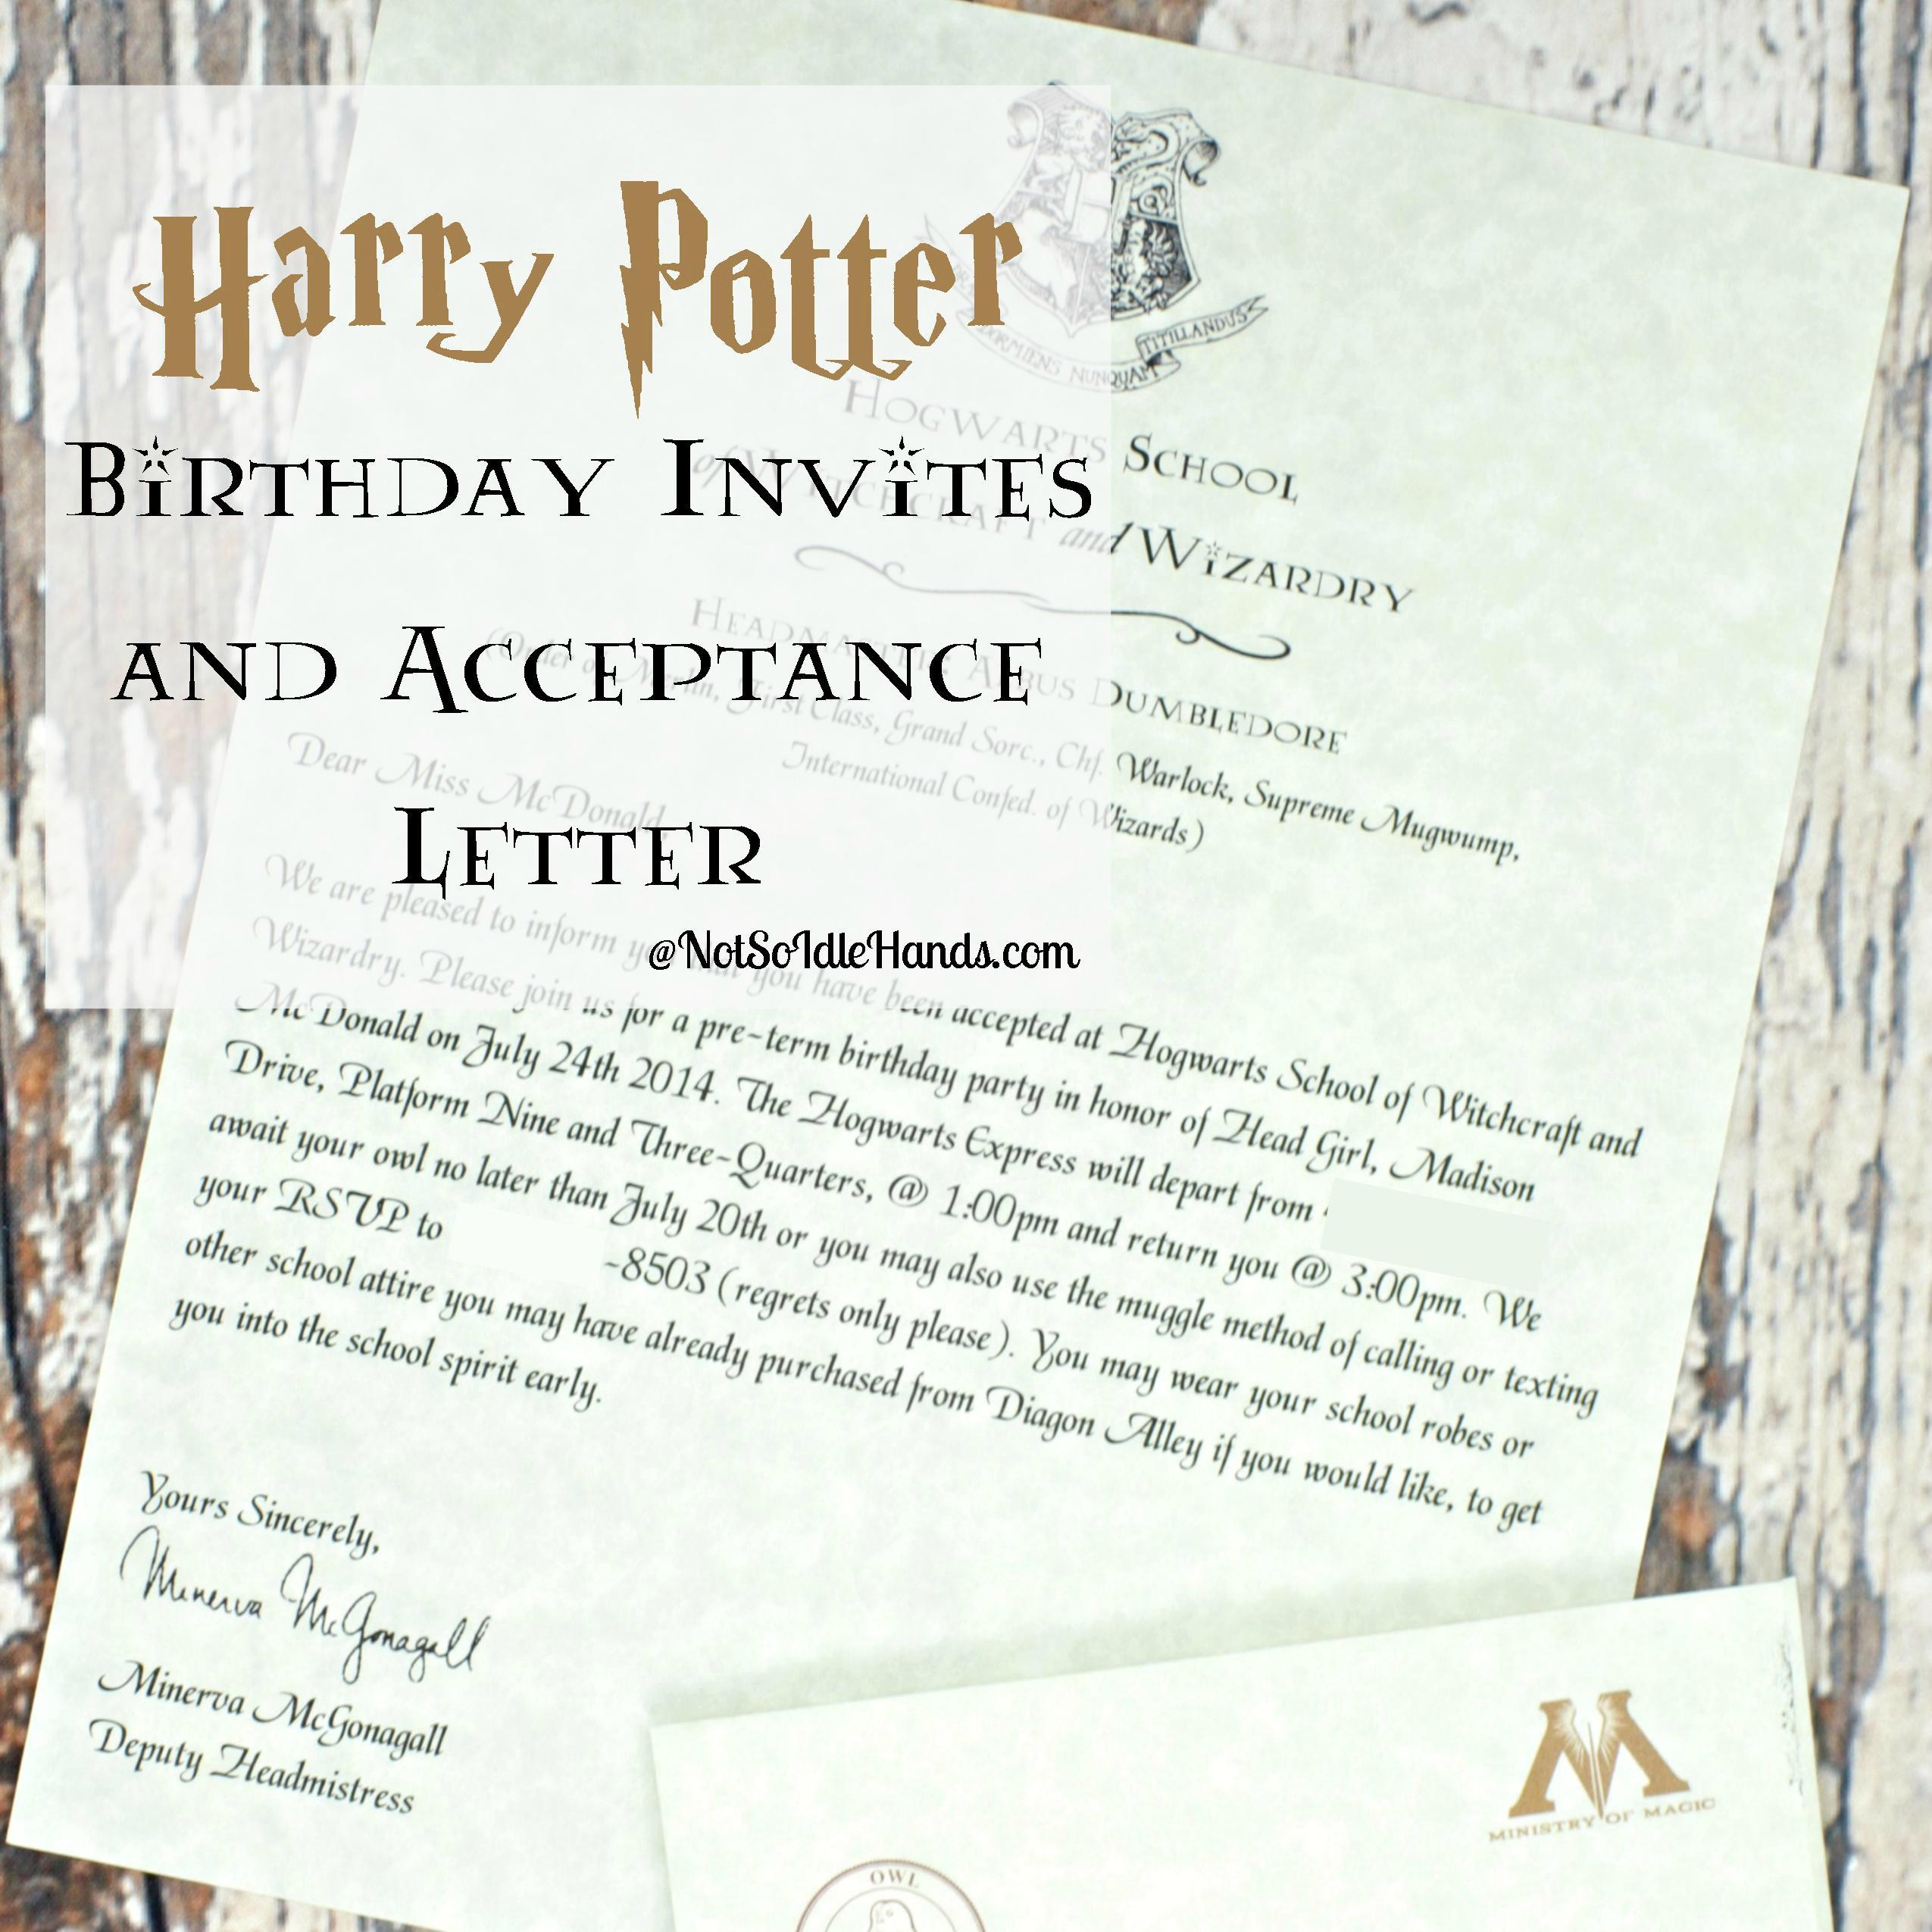 Harry Potter Birthday Invitations And Authentic Acceptance Letter - Harry Potter Birthday Invitations Free Printable